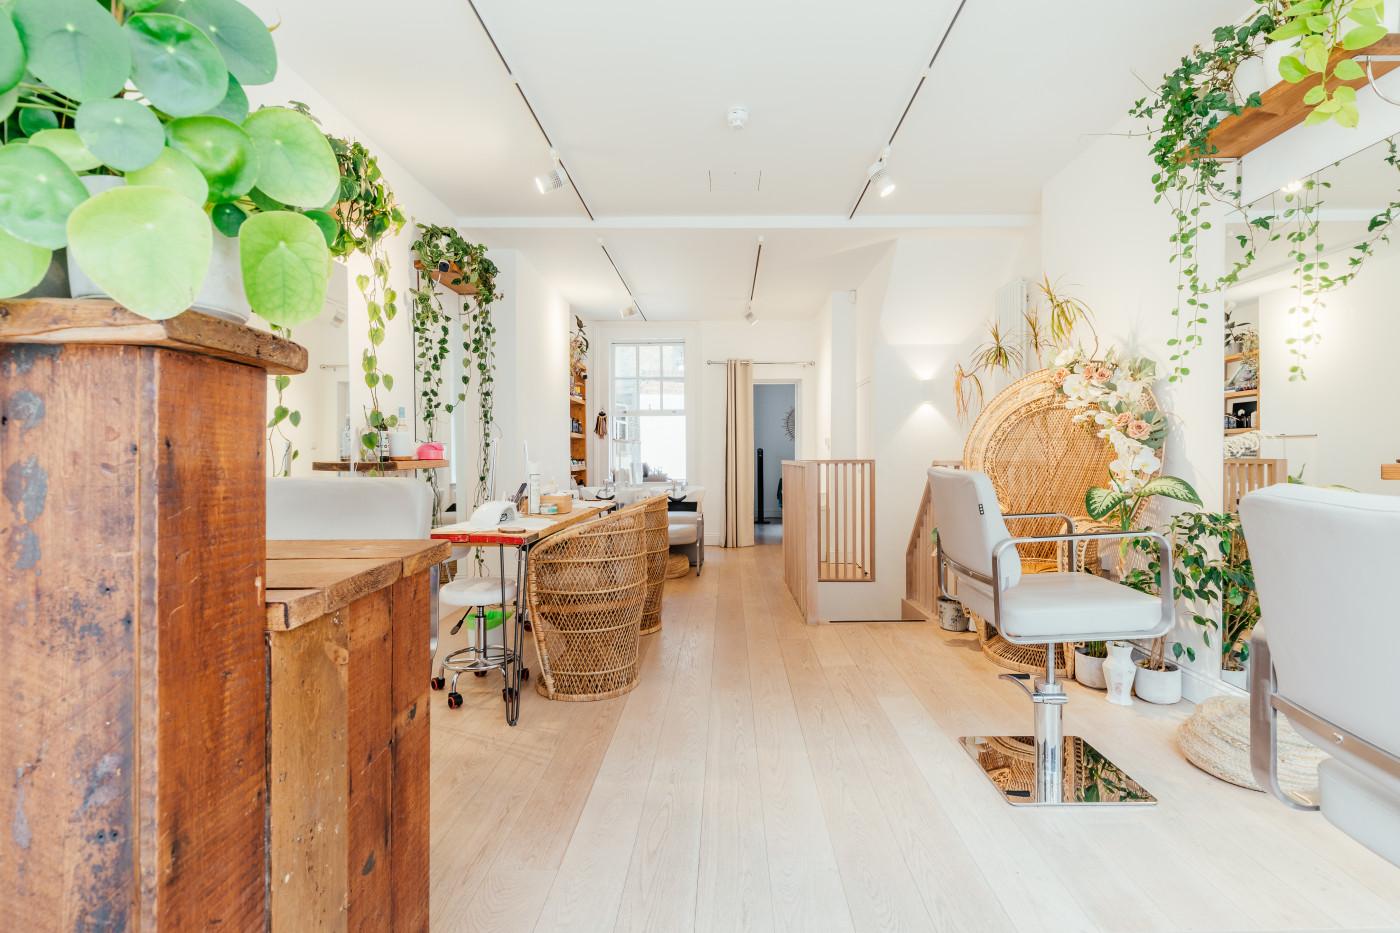 eco-friendly salon swaps